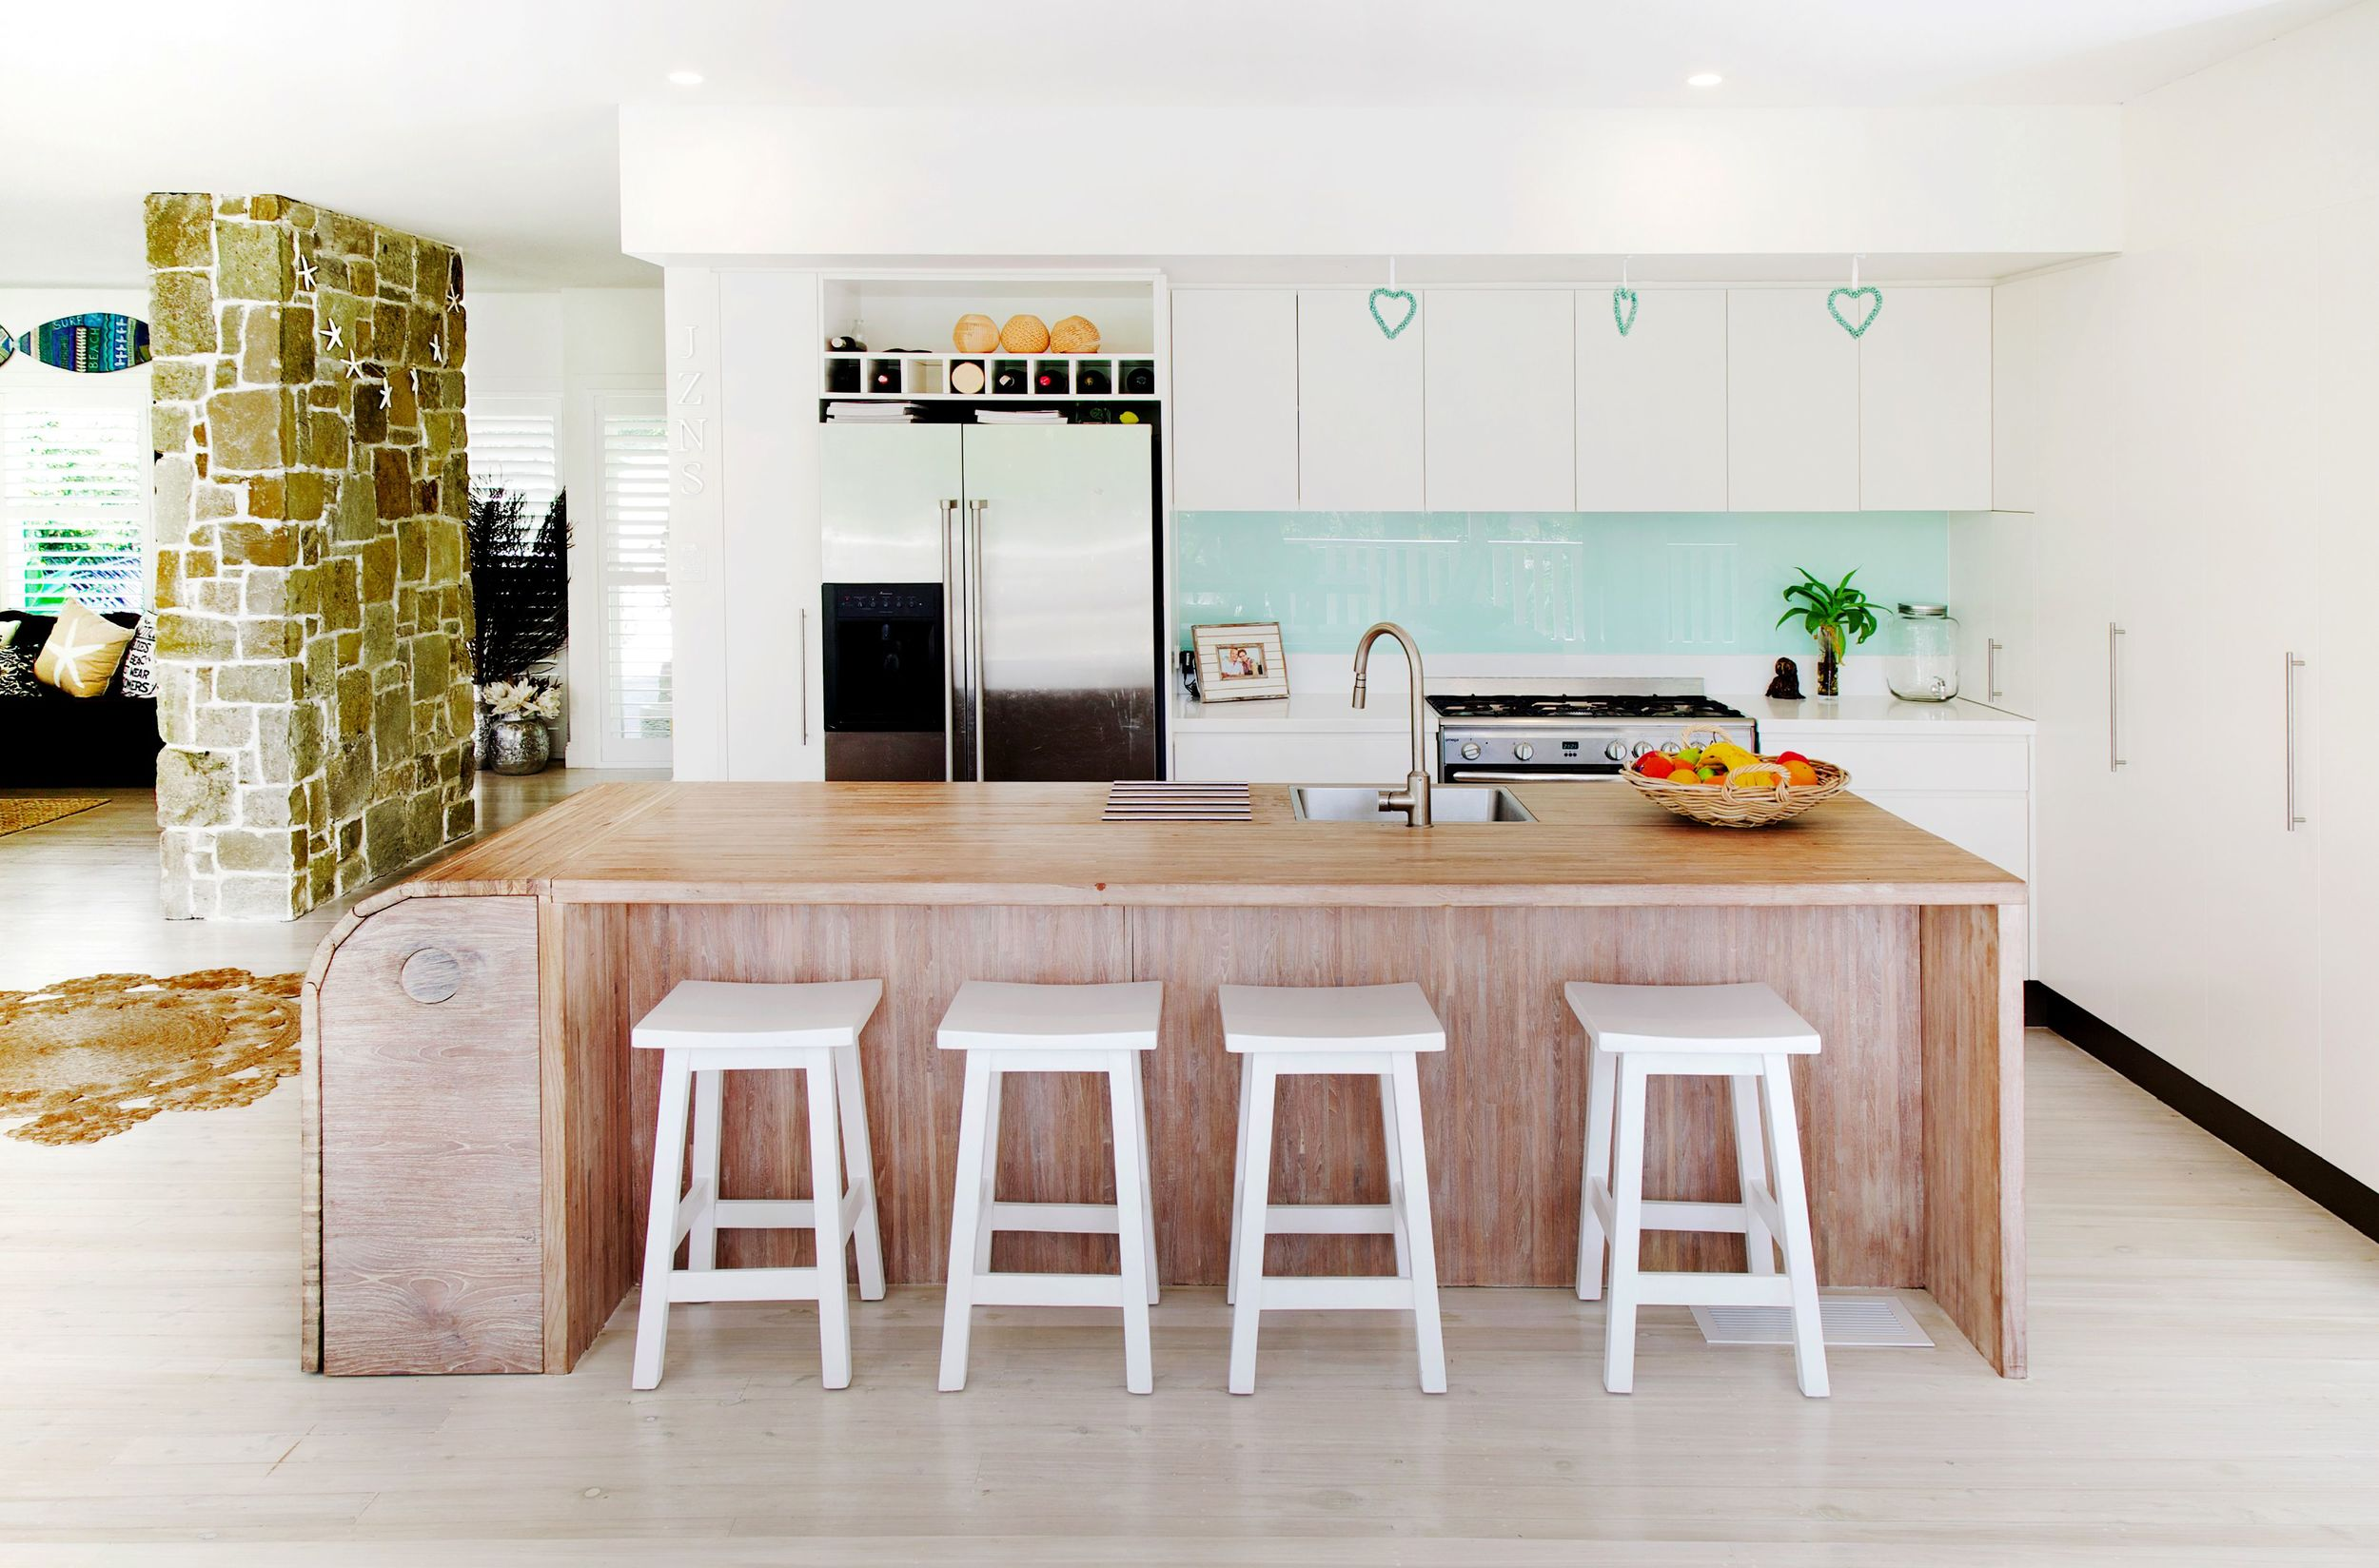 Nvisage_Custom_Home_Design_Alteration_Addition_Freeman4.jpg